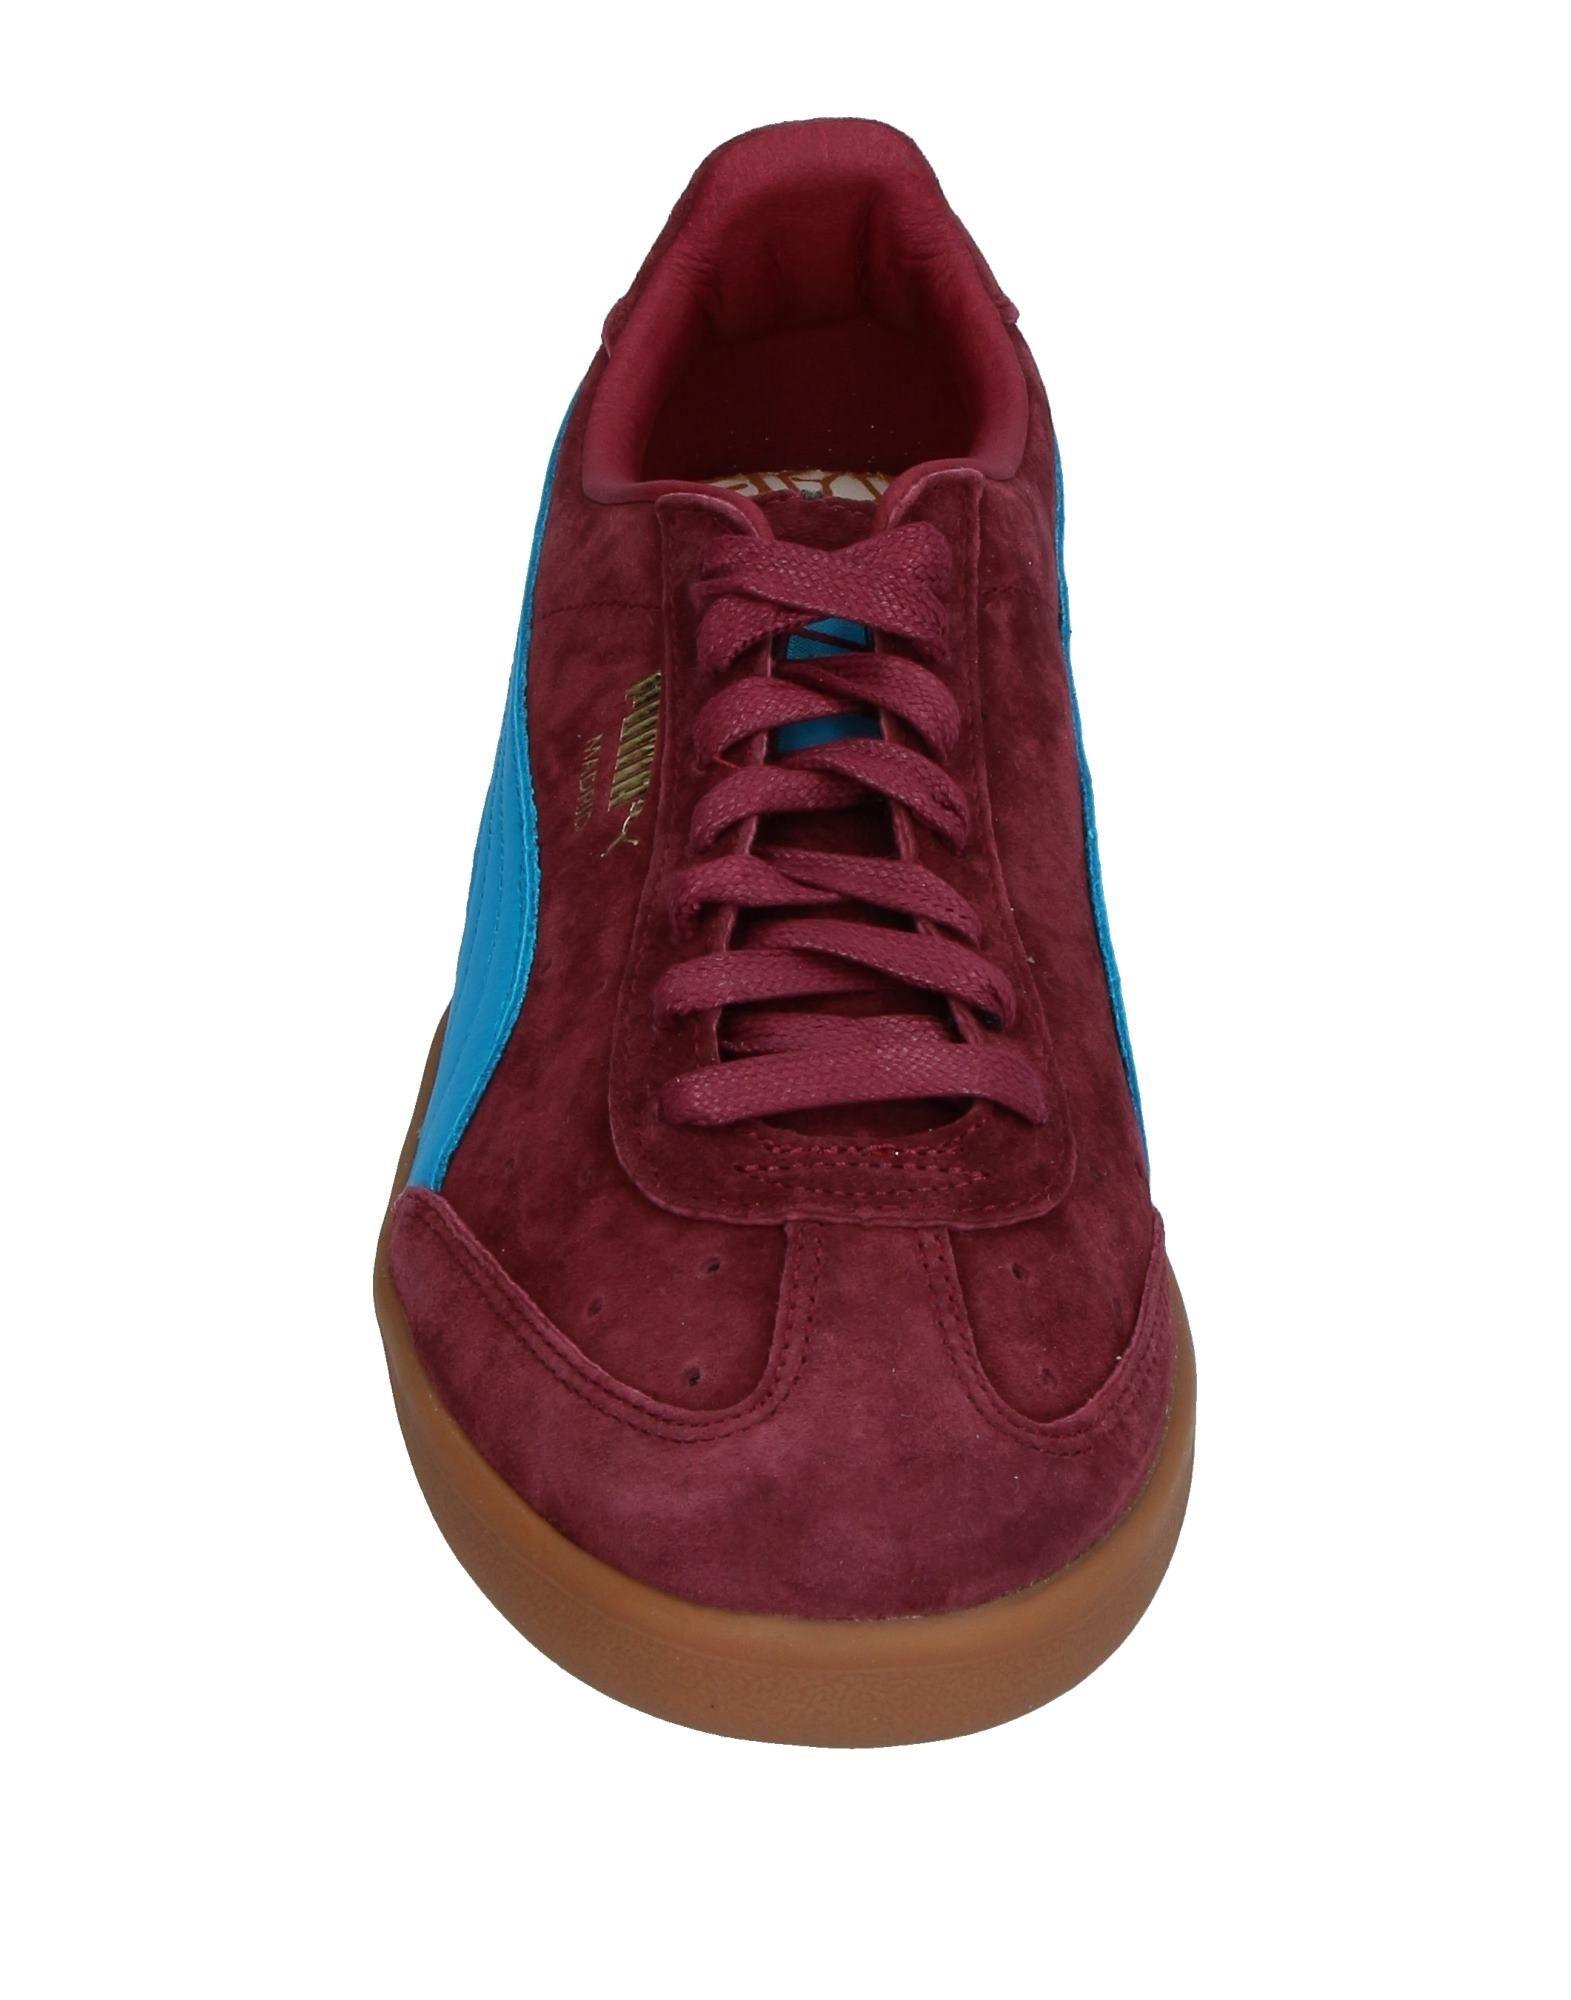 Rabatt echte Schuhe Puma Sneakers Herren  11267970KK